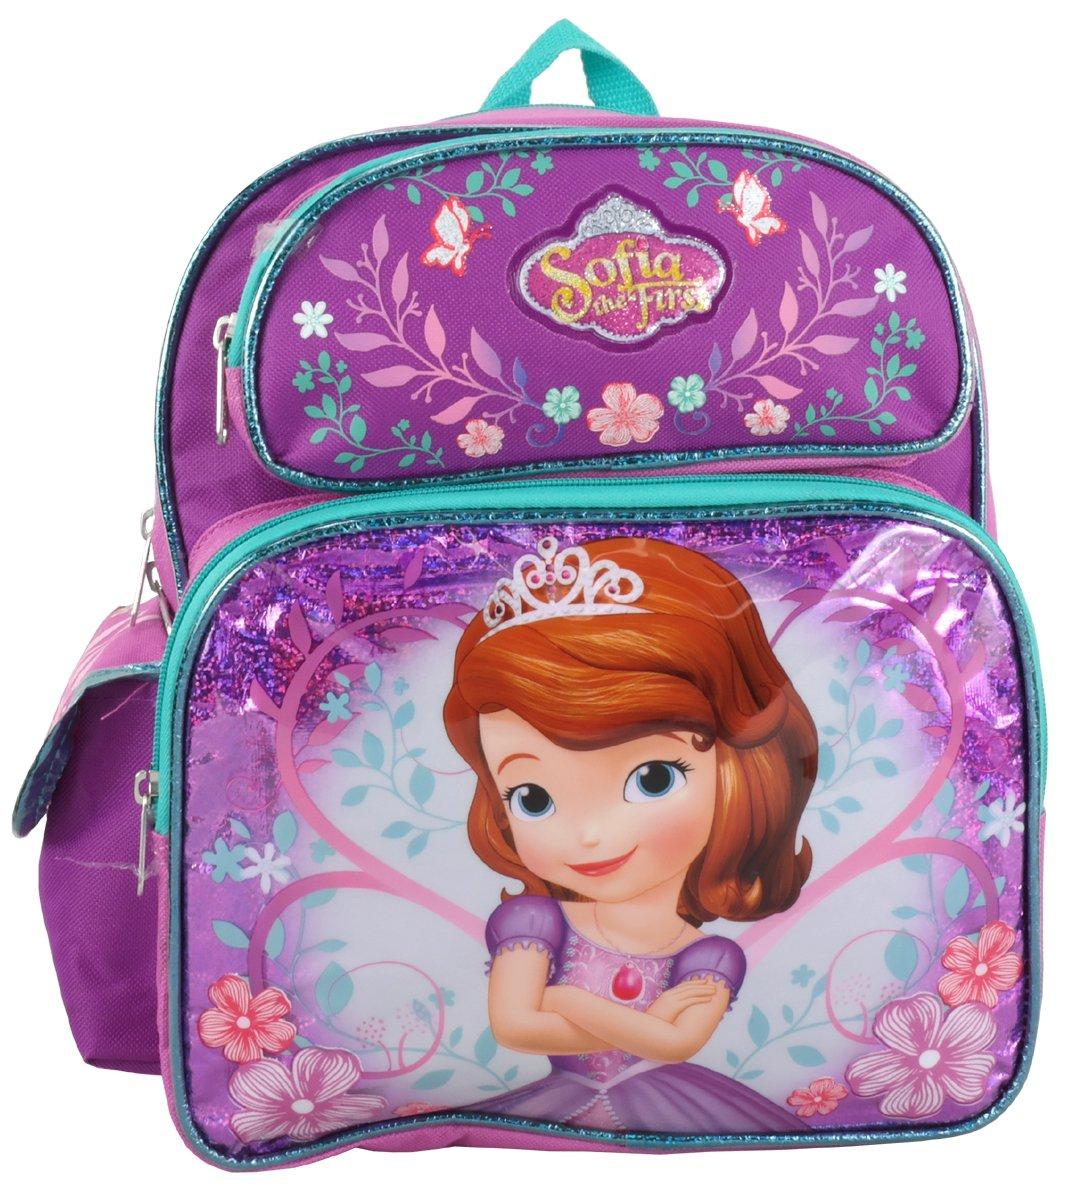 397adb507131 Buy Disney Princess Sofia The First 12